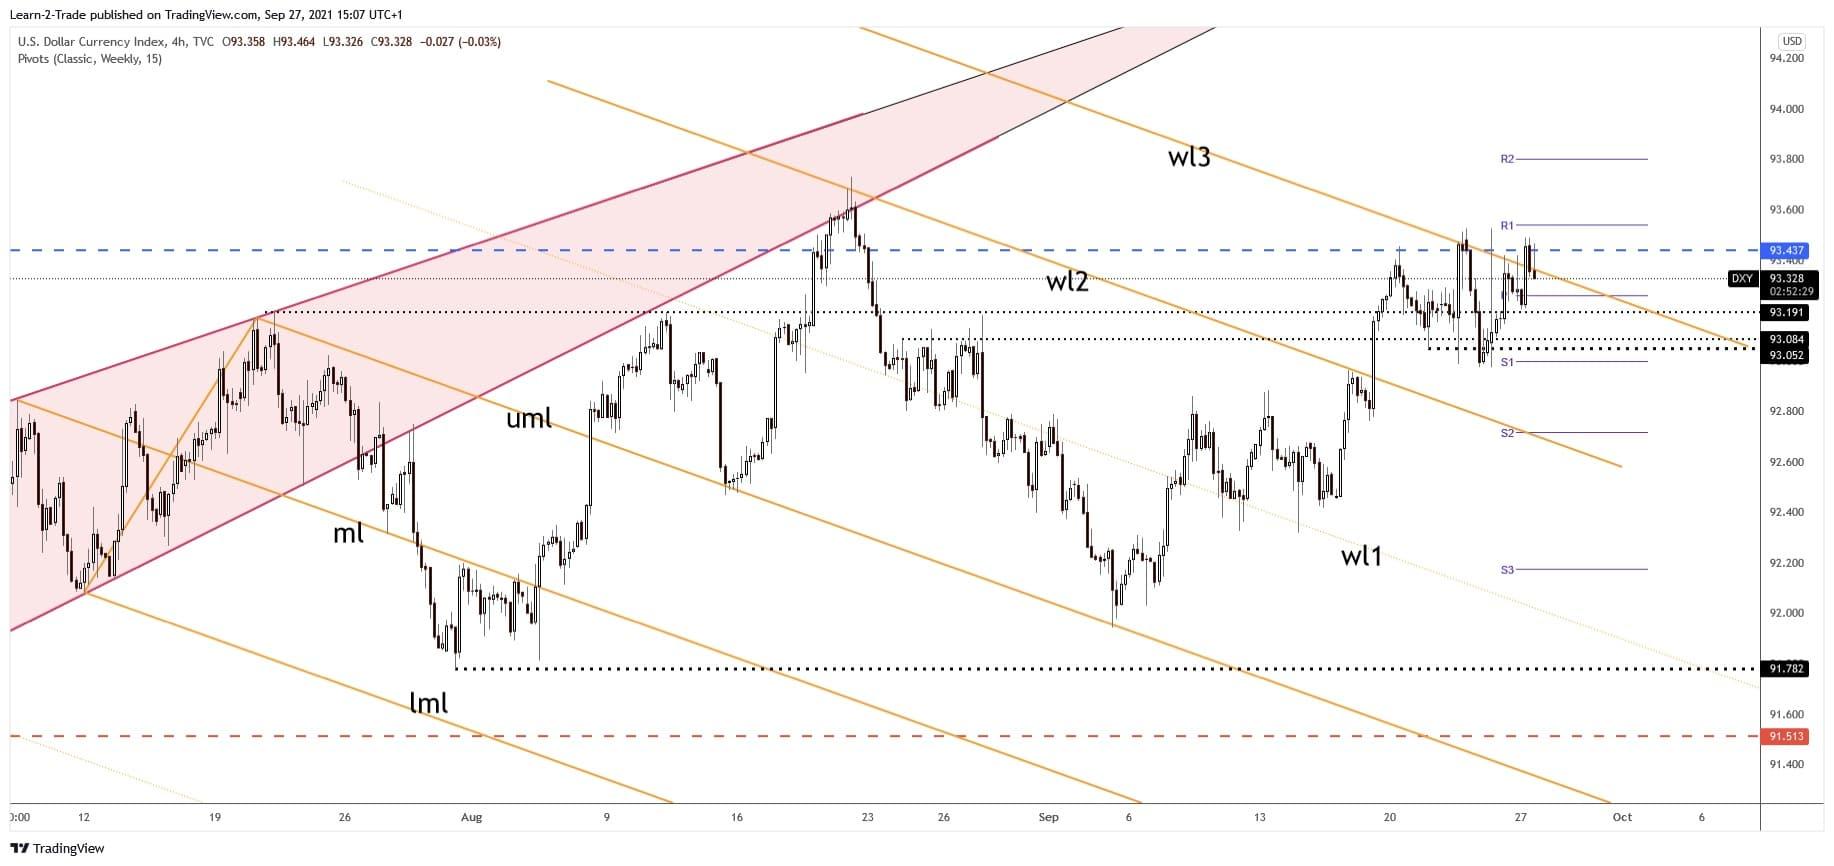 US dollar index dxy